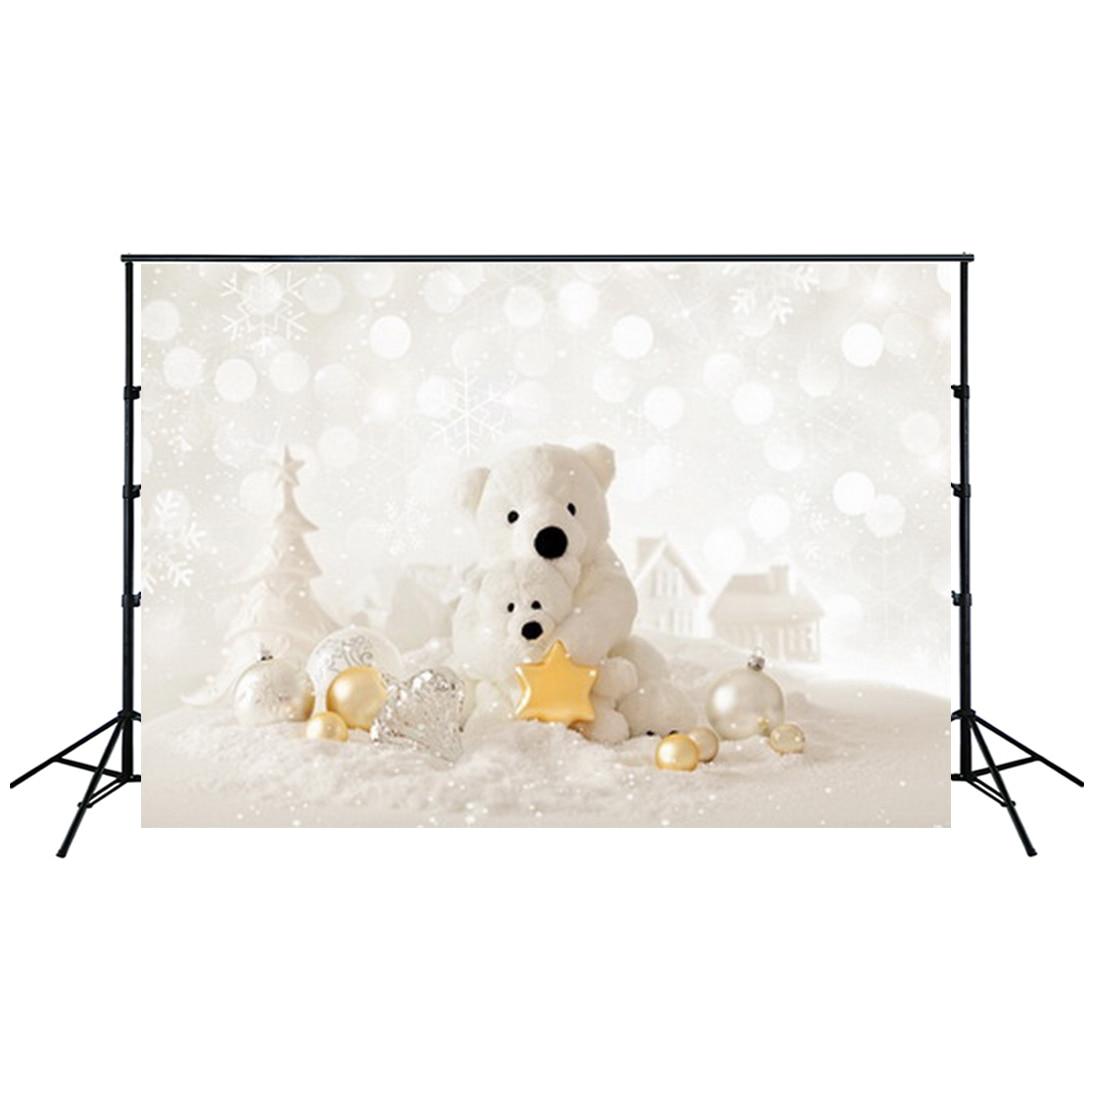 HUAYI Photography Backdrop christmas backdrops Photo Prop Christmas decoration Art Fabric backgrounds D-8951